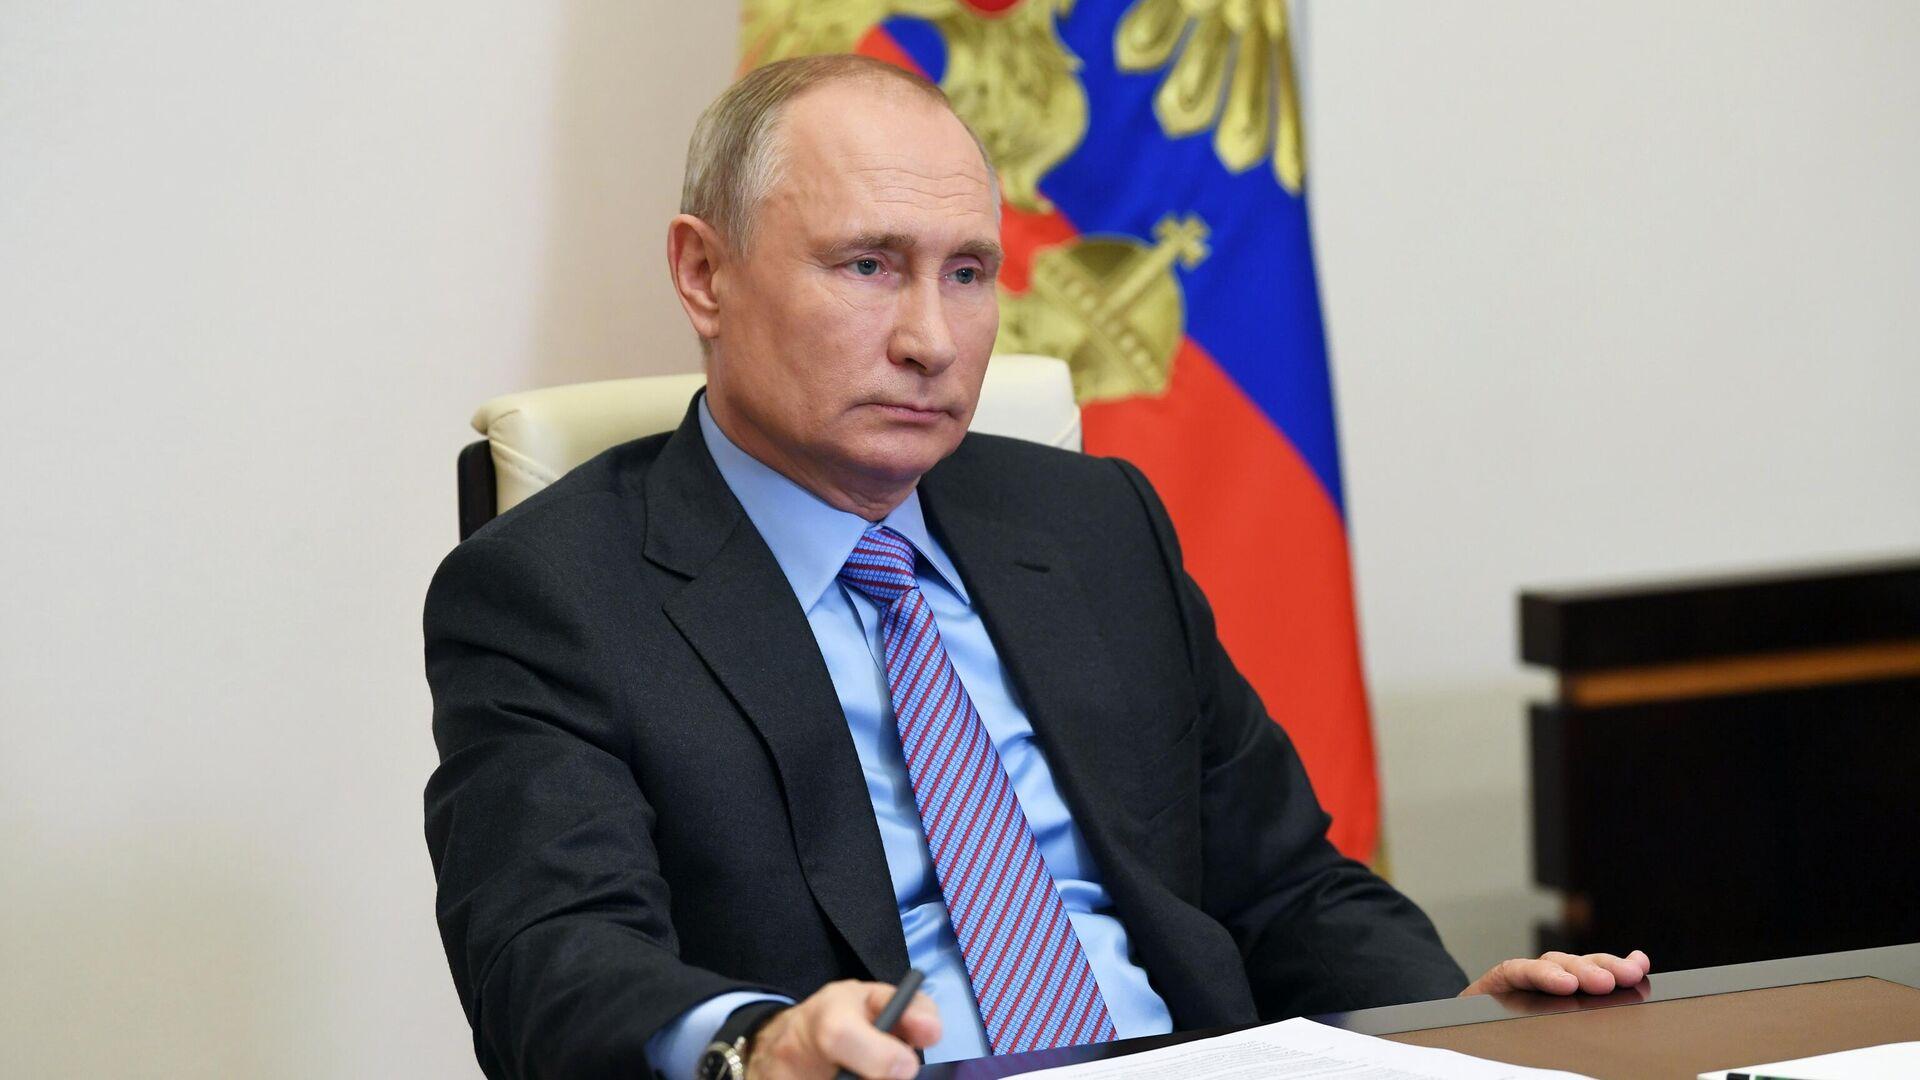 Президент РФ Владимир Путин - РИА Новости, 1920, 22.12.2020